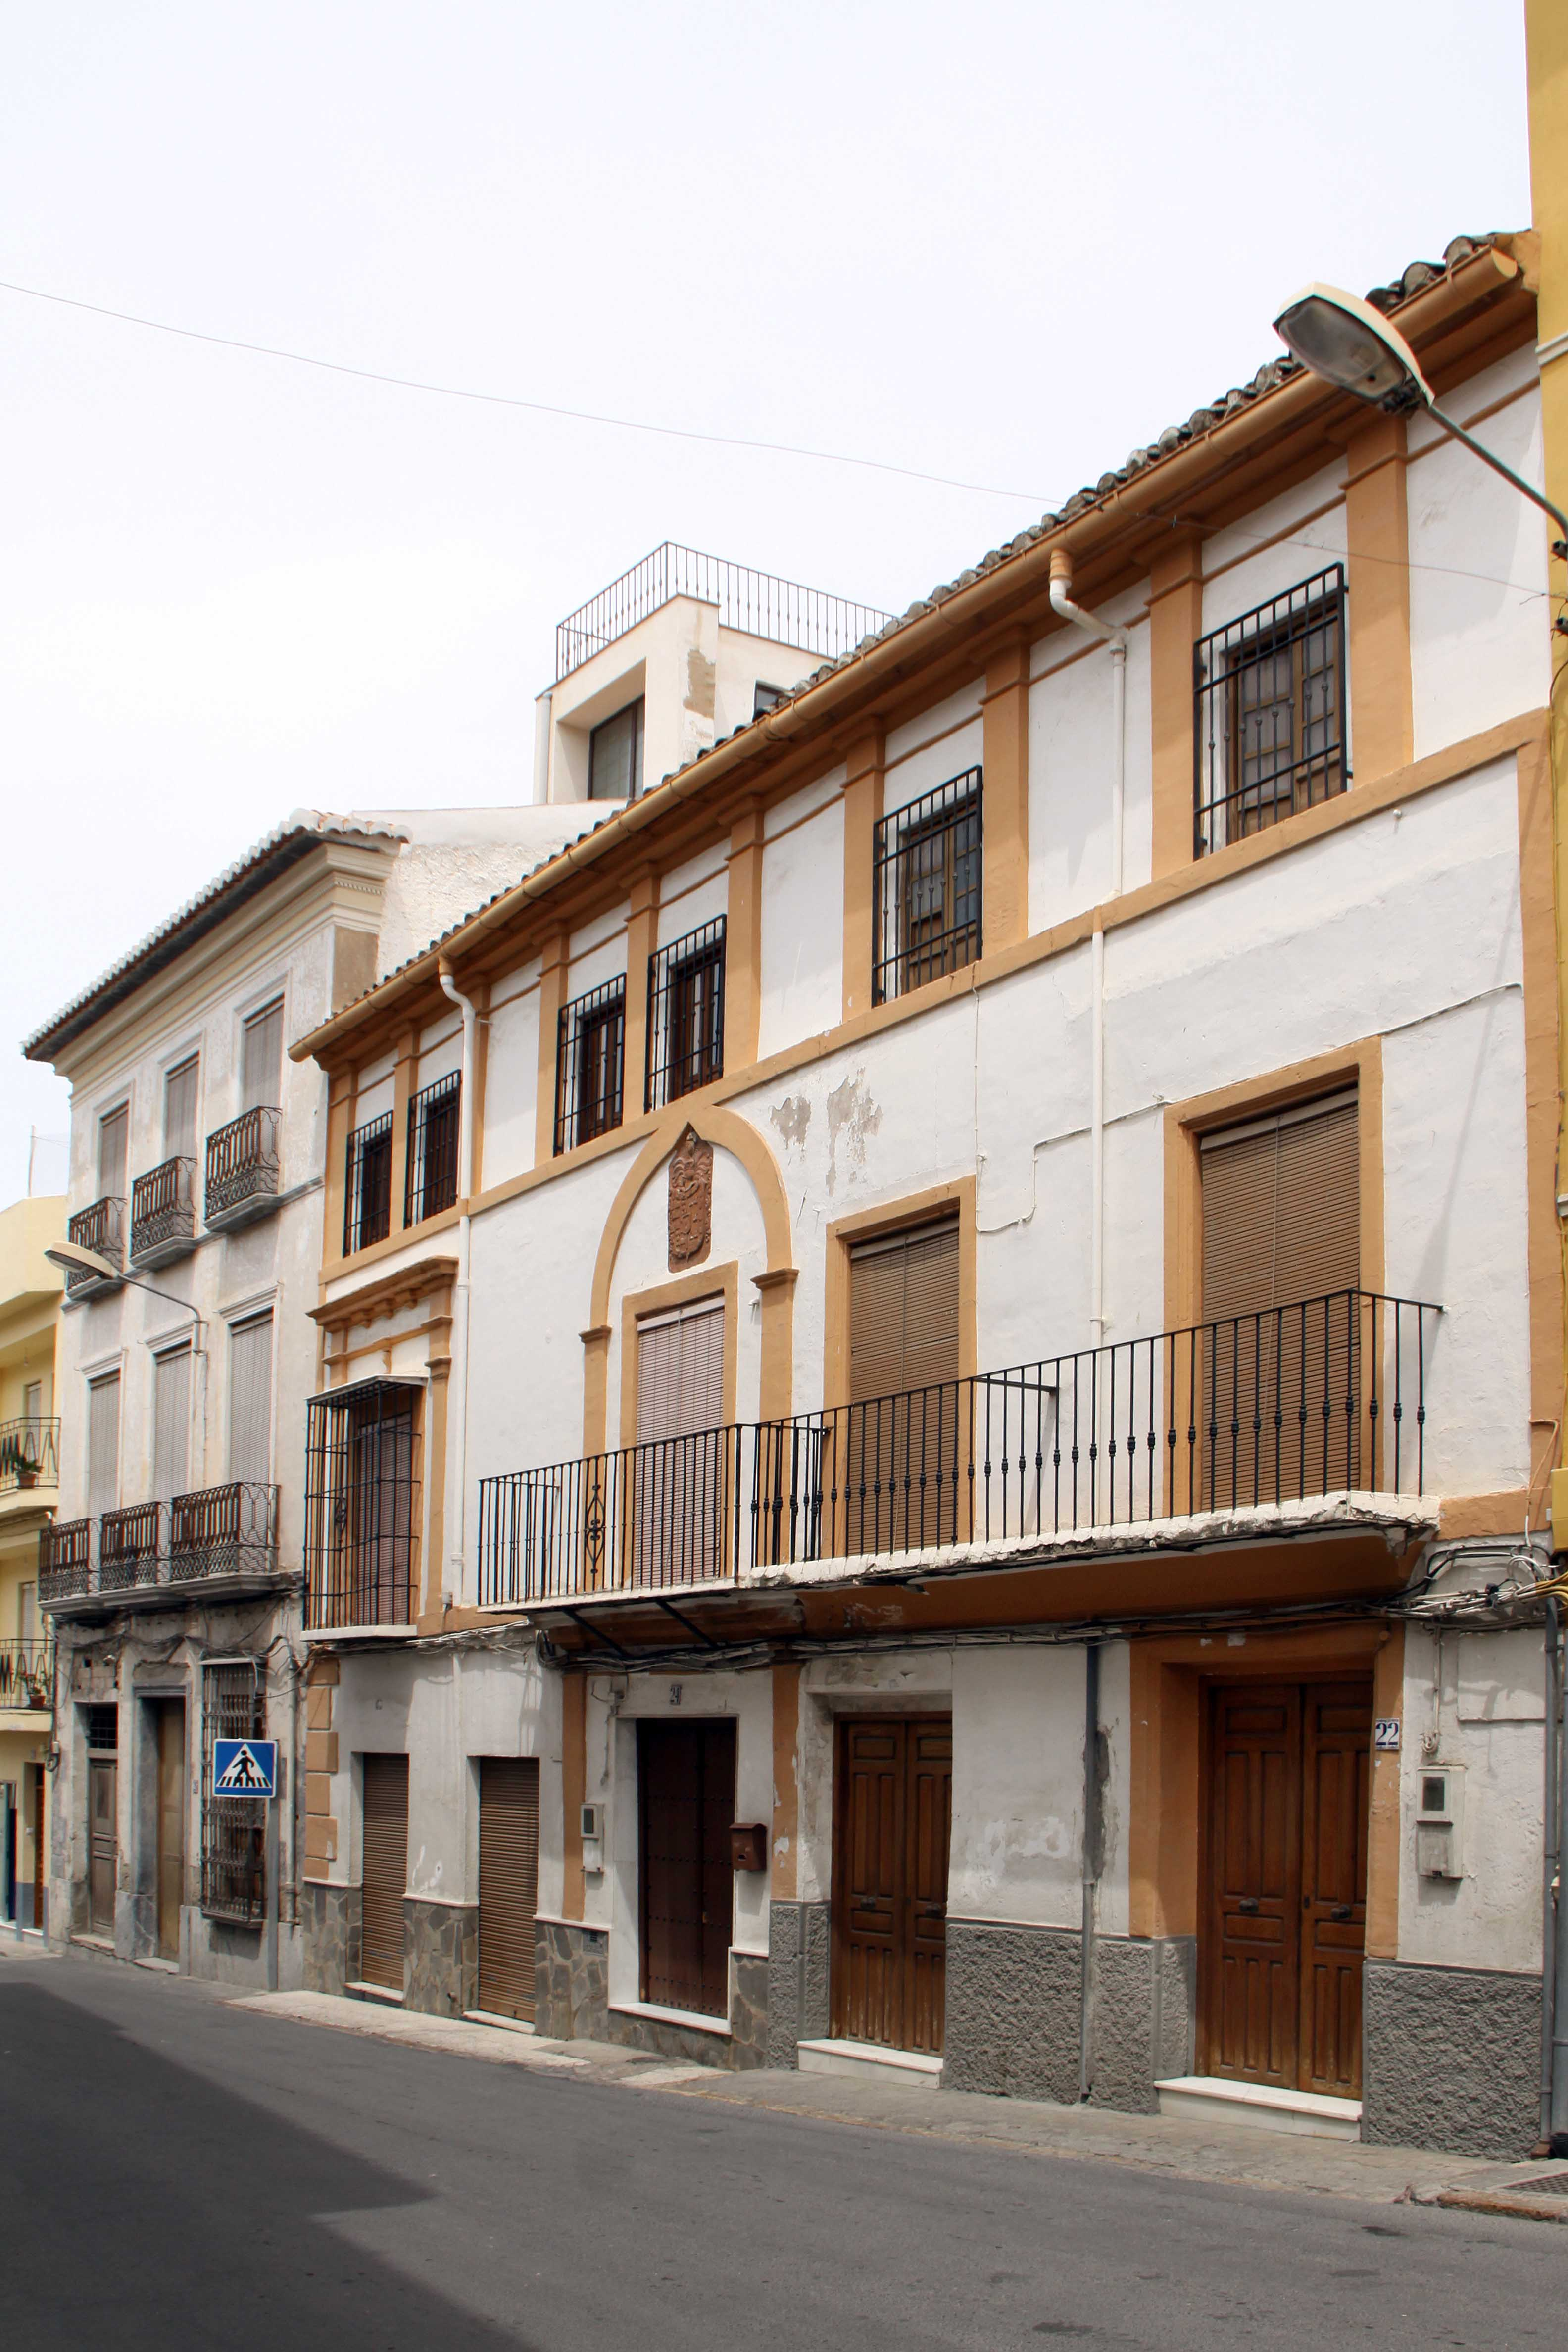 Casa de la familia Zapata-Pimentel en la calle del Agua. © Fotografía Pako Manzano